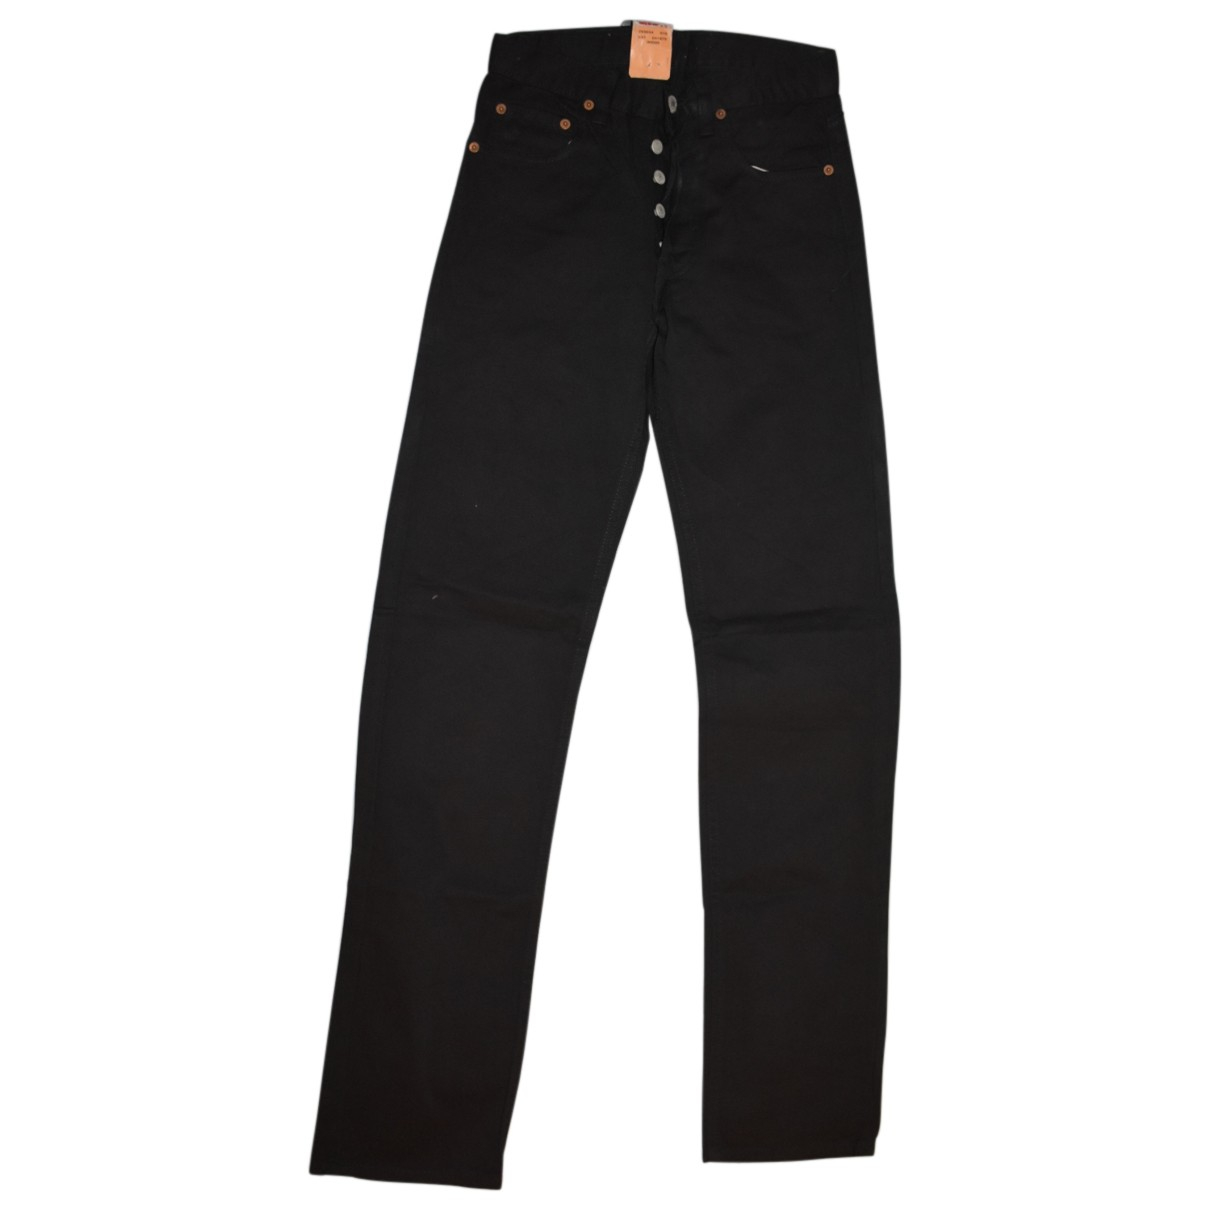 Levi's Vintage Clothing Straight pants